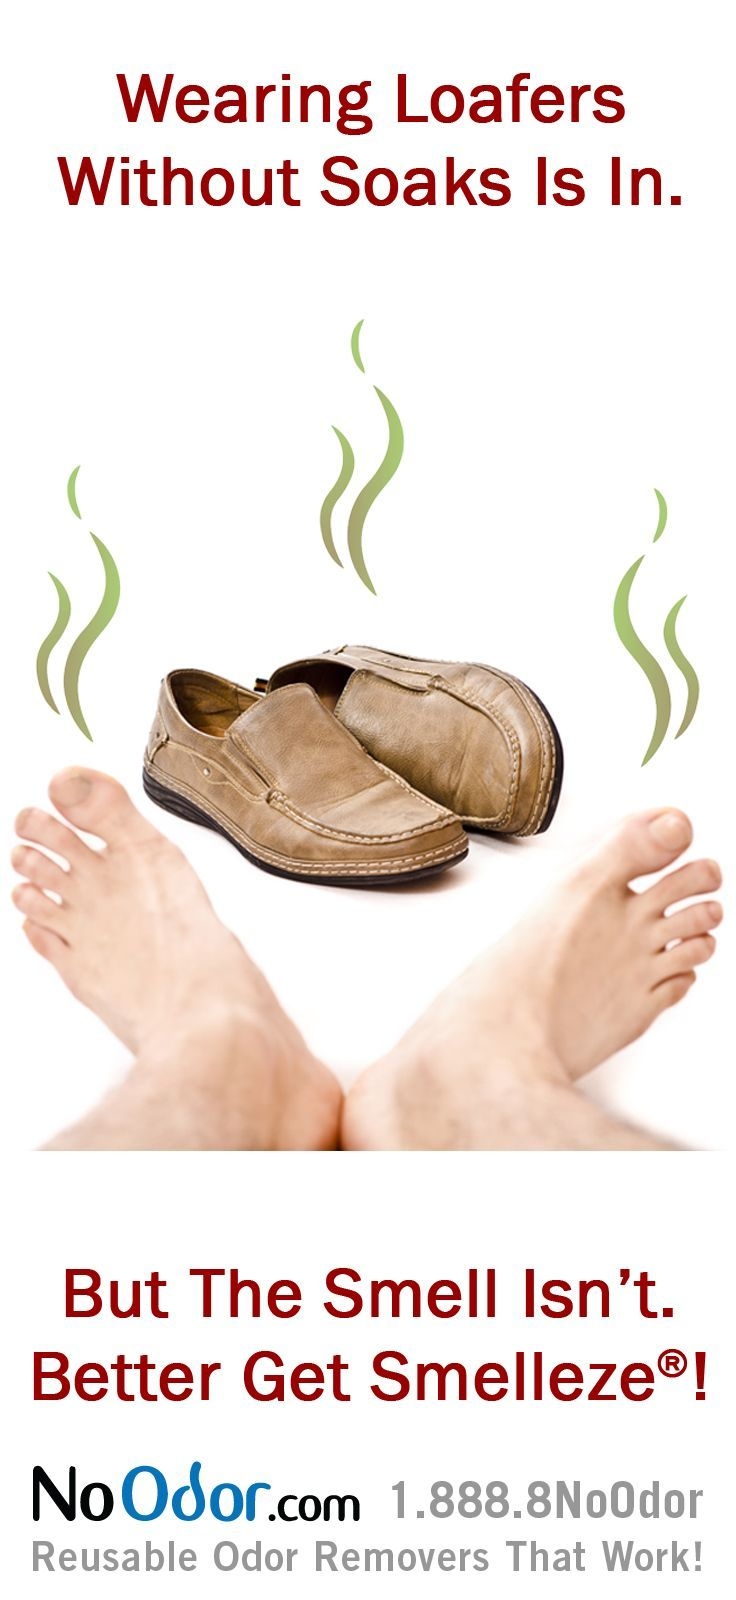 Smelleze  Reusable Shoe Smell Eliminator rids shoe smell naturally without  fragrances  It s reusable. 25  unique Shoe smell remover ideas on Pinterest   How to